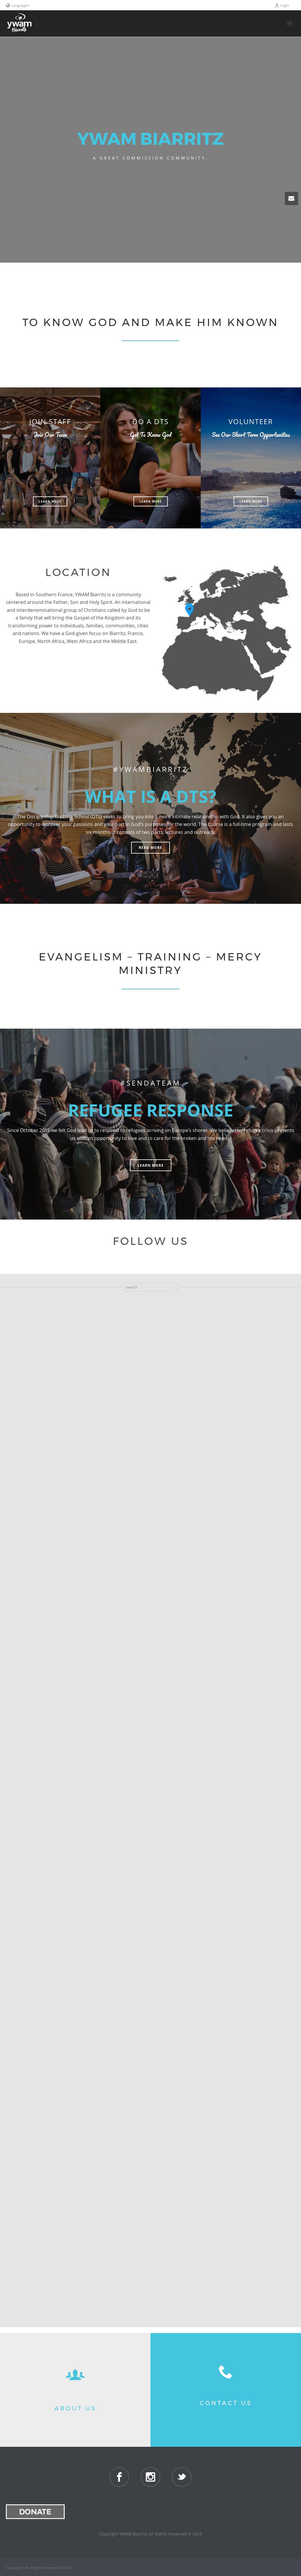 Ywam Biarritz// Jem Biarritz Competitors, Revenue and